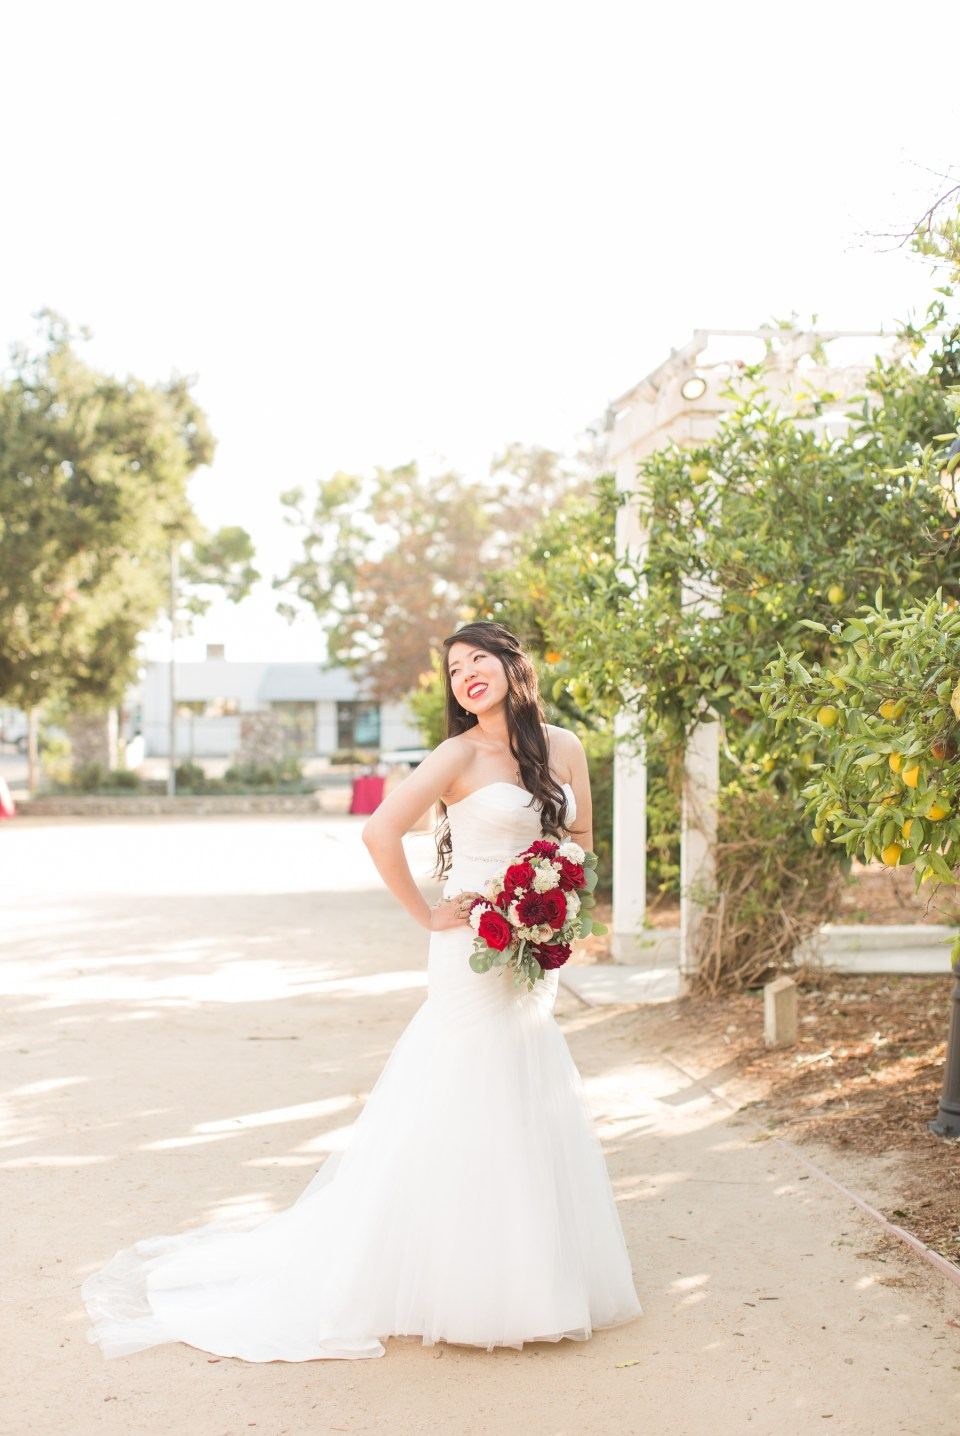 Happy Bride on Wedding Day